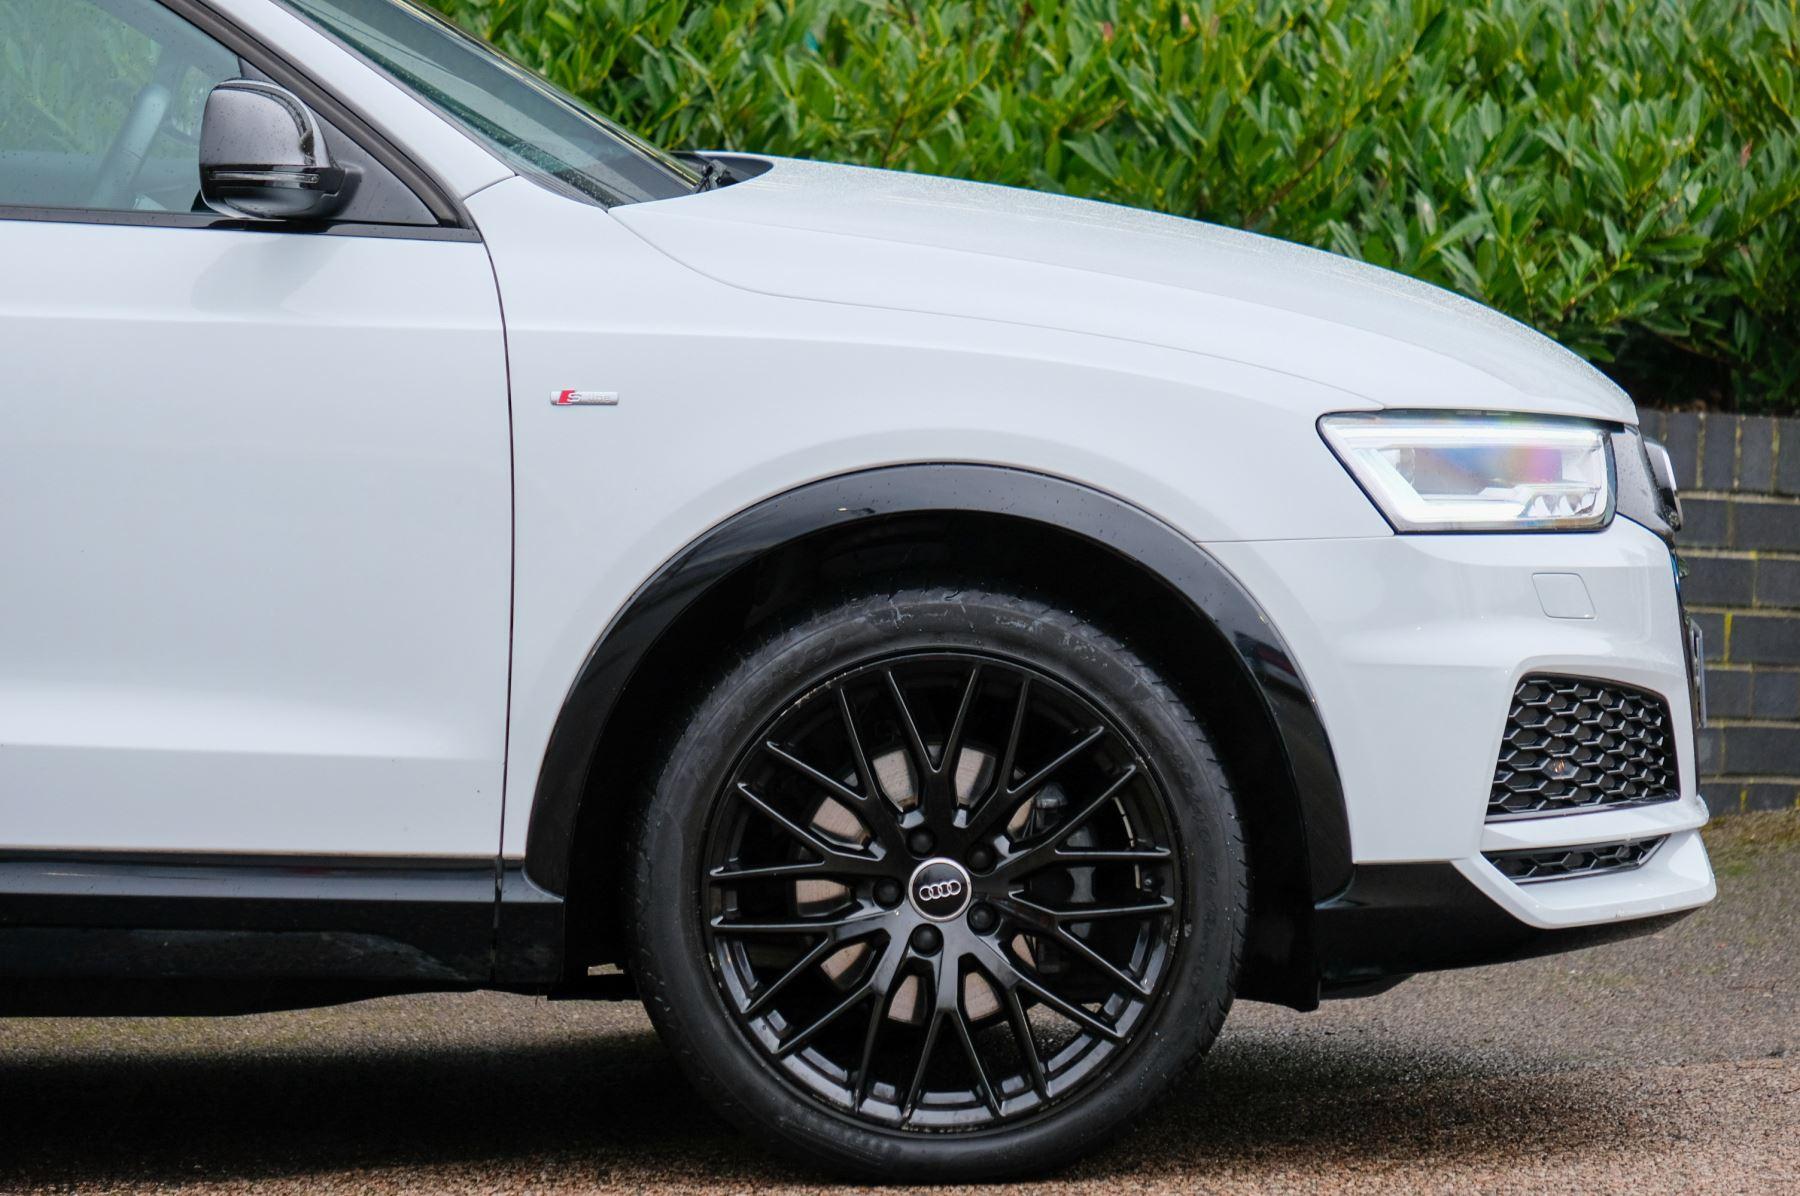 Audi Q3 2.0T FSI Quattro Black Edition 5dr S Tronic - Panoramic glass sunroof image 8